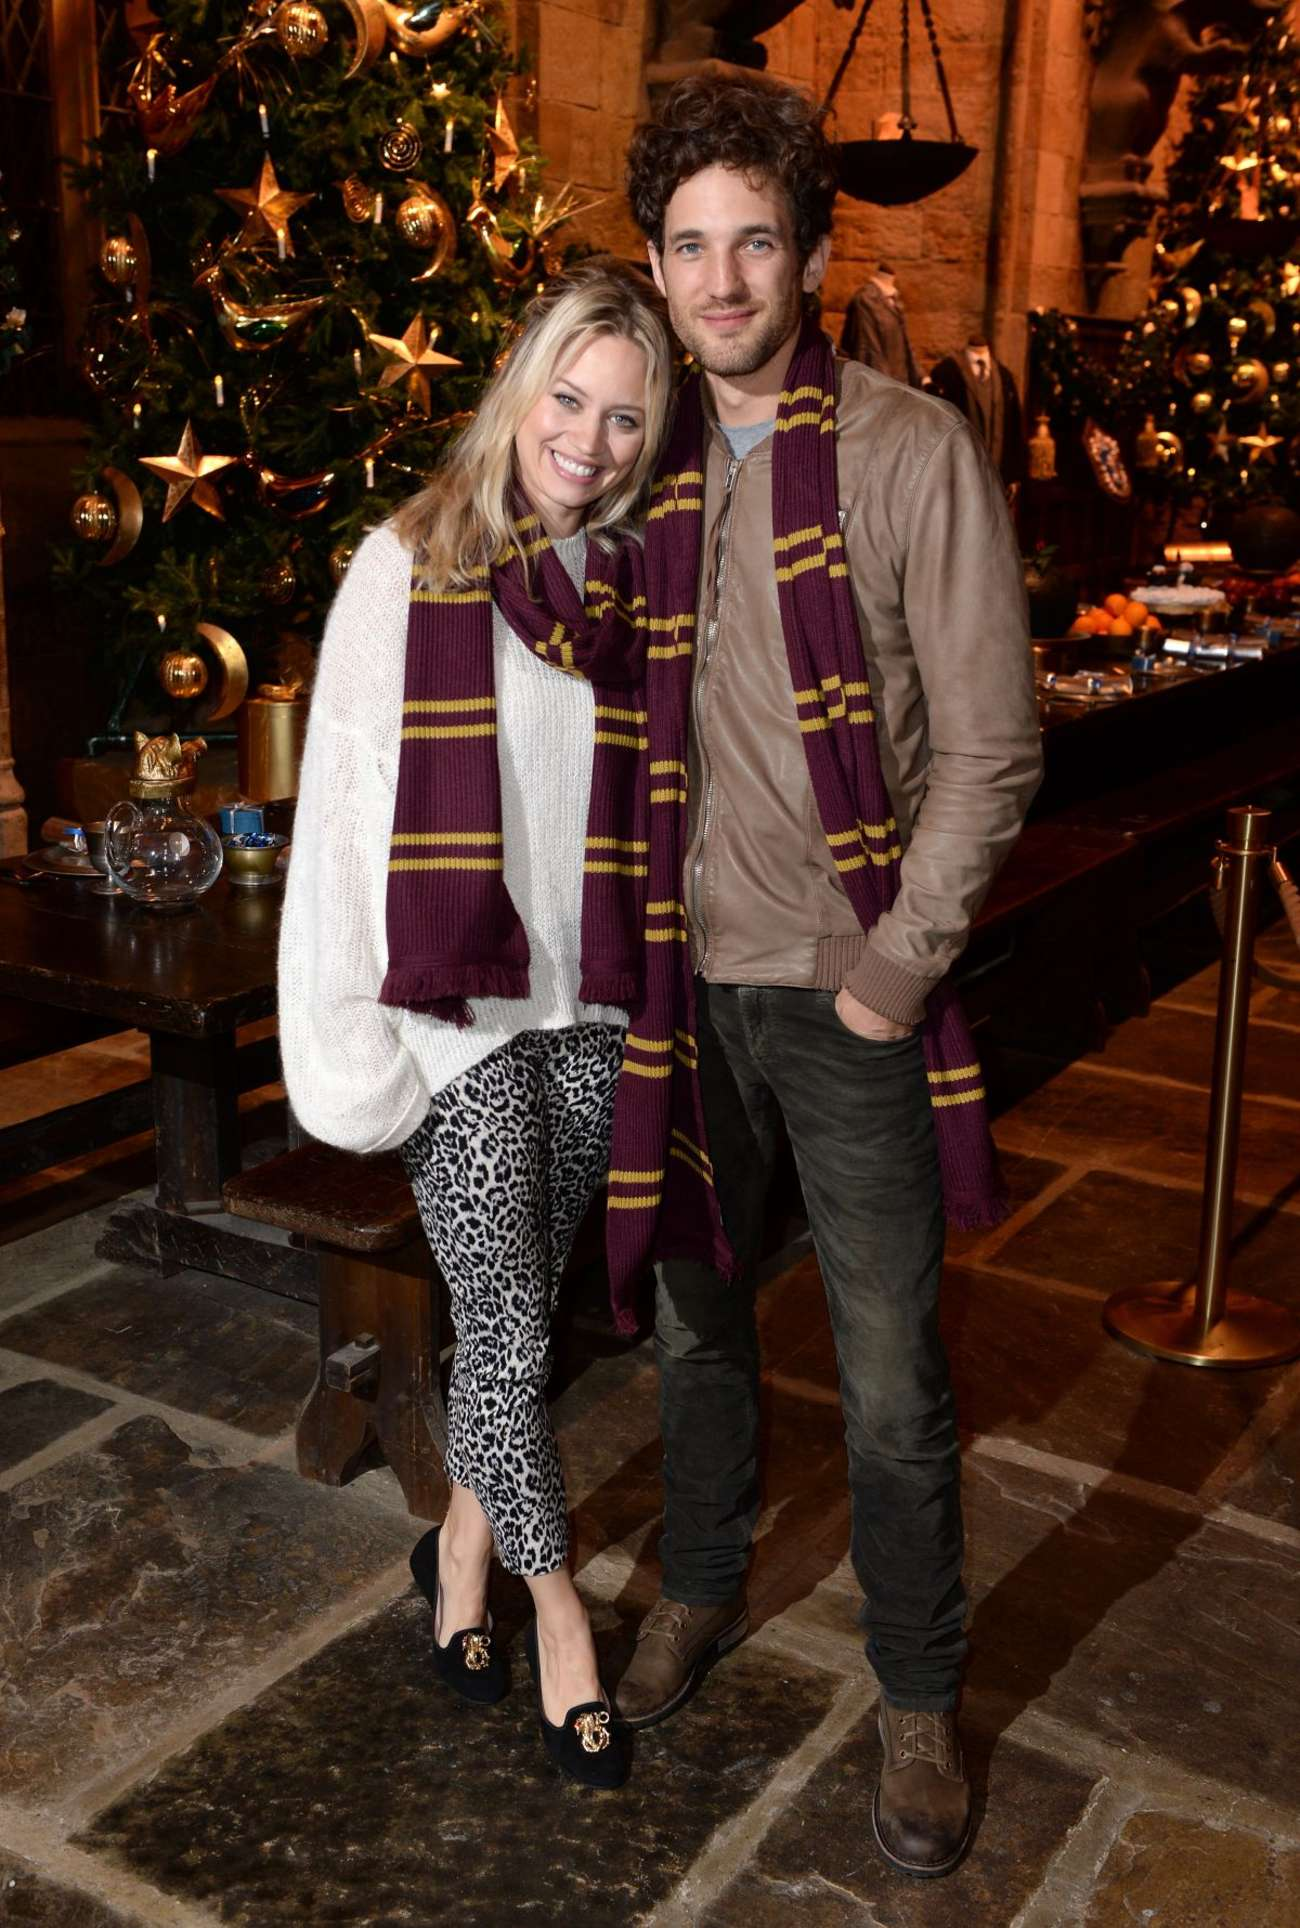 Kimberly Wyatt 2015 : Kimberly Wyatt: Hogwarts in The Snow Launch -02